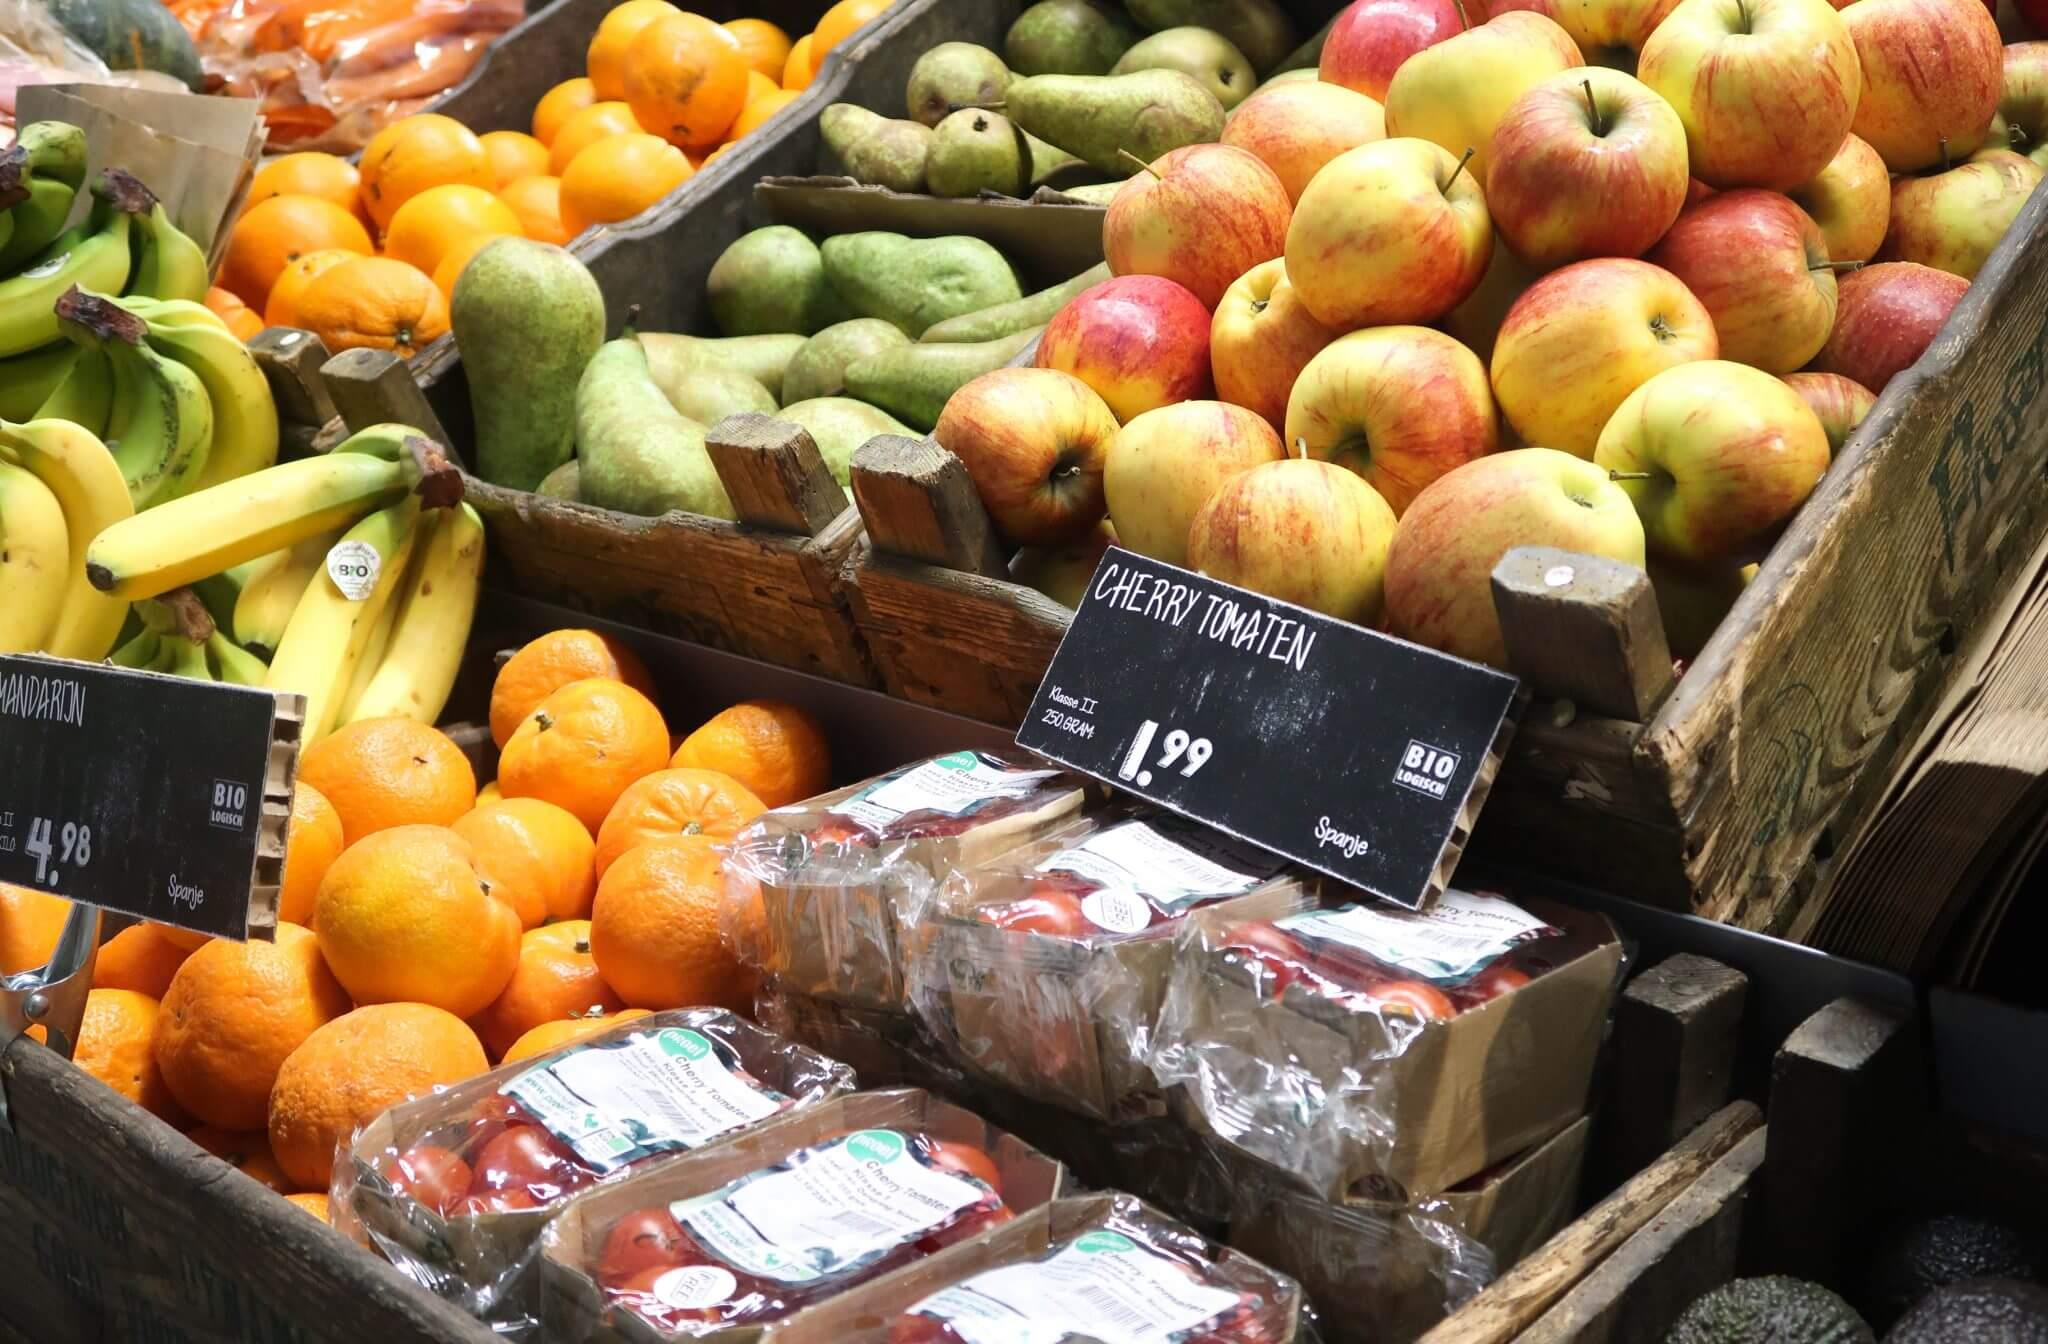 ekoplaza-plasticvrije-supermarkt (1 van 1)